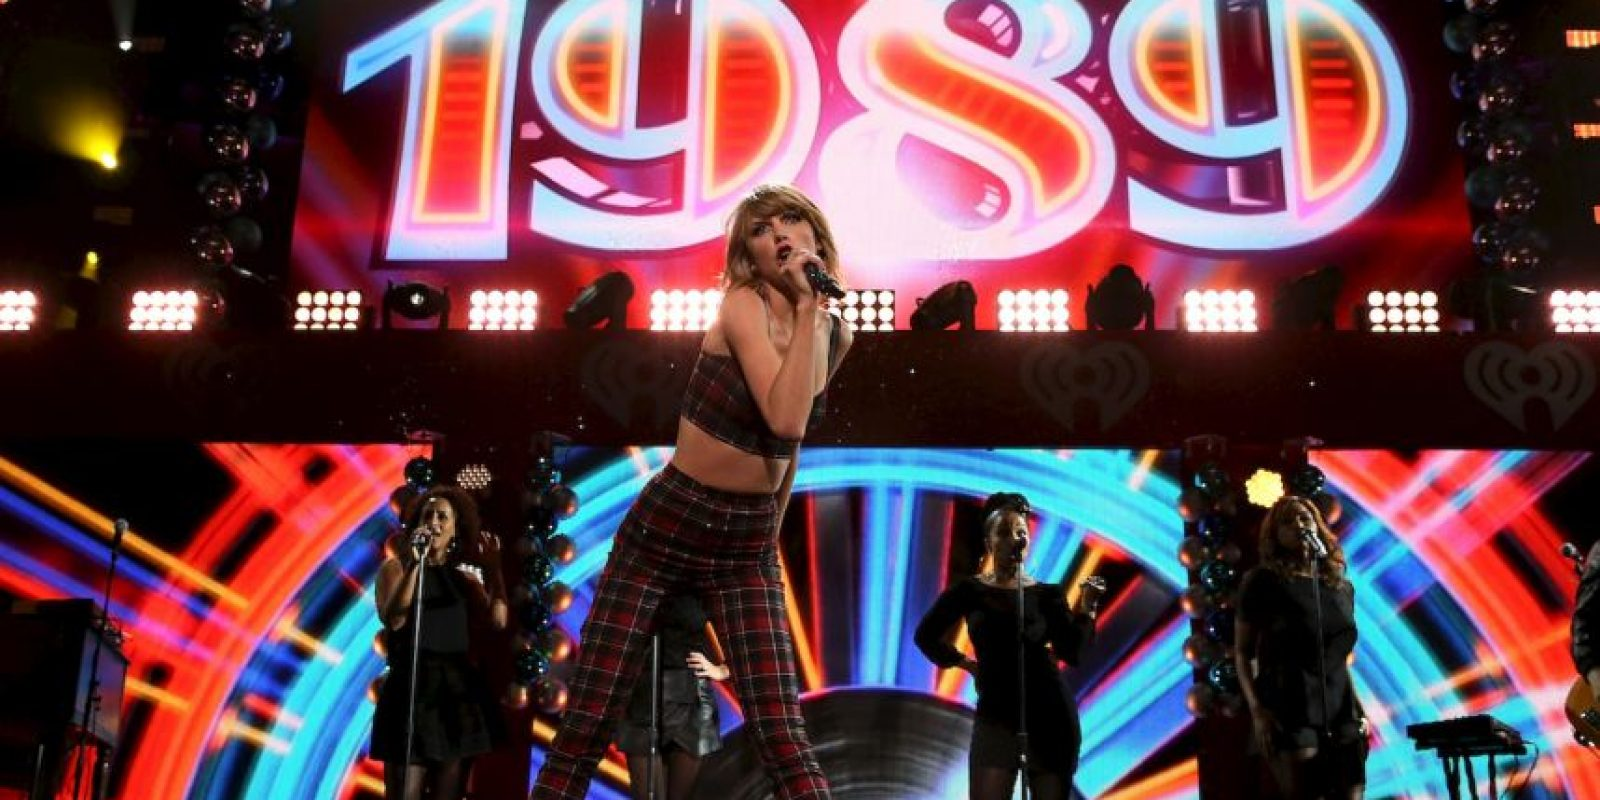 """The 1989 Tour"" es la cuarta gira que Taylor Swift realiza. Foto:Getty Images"